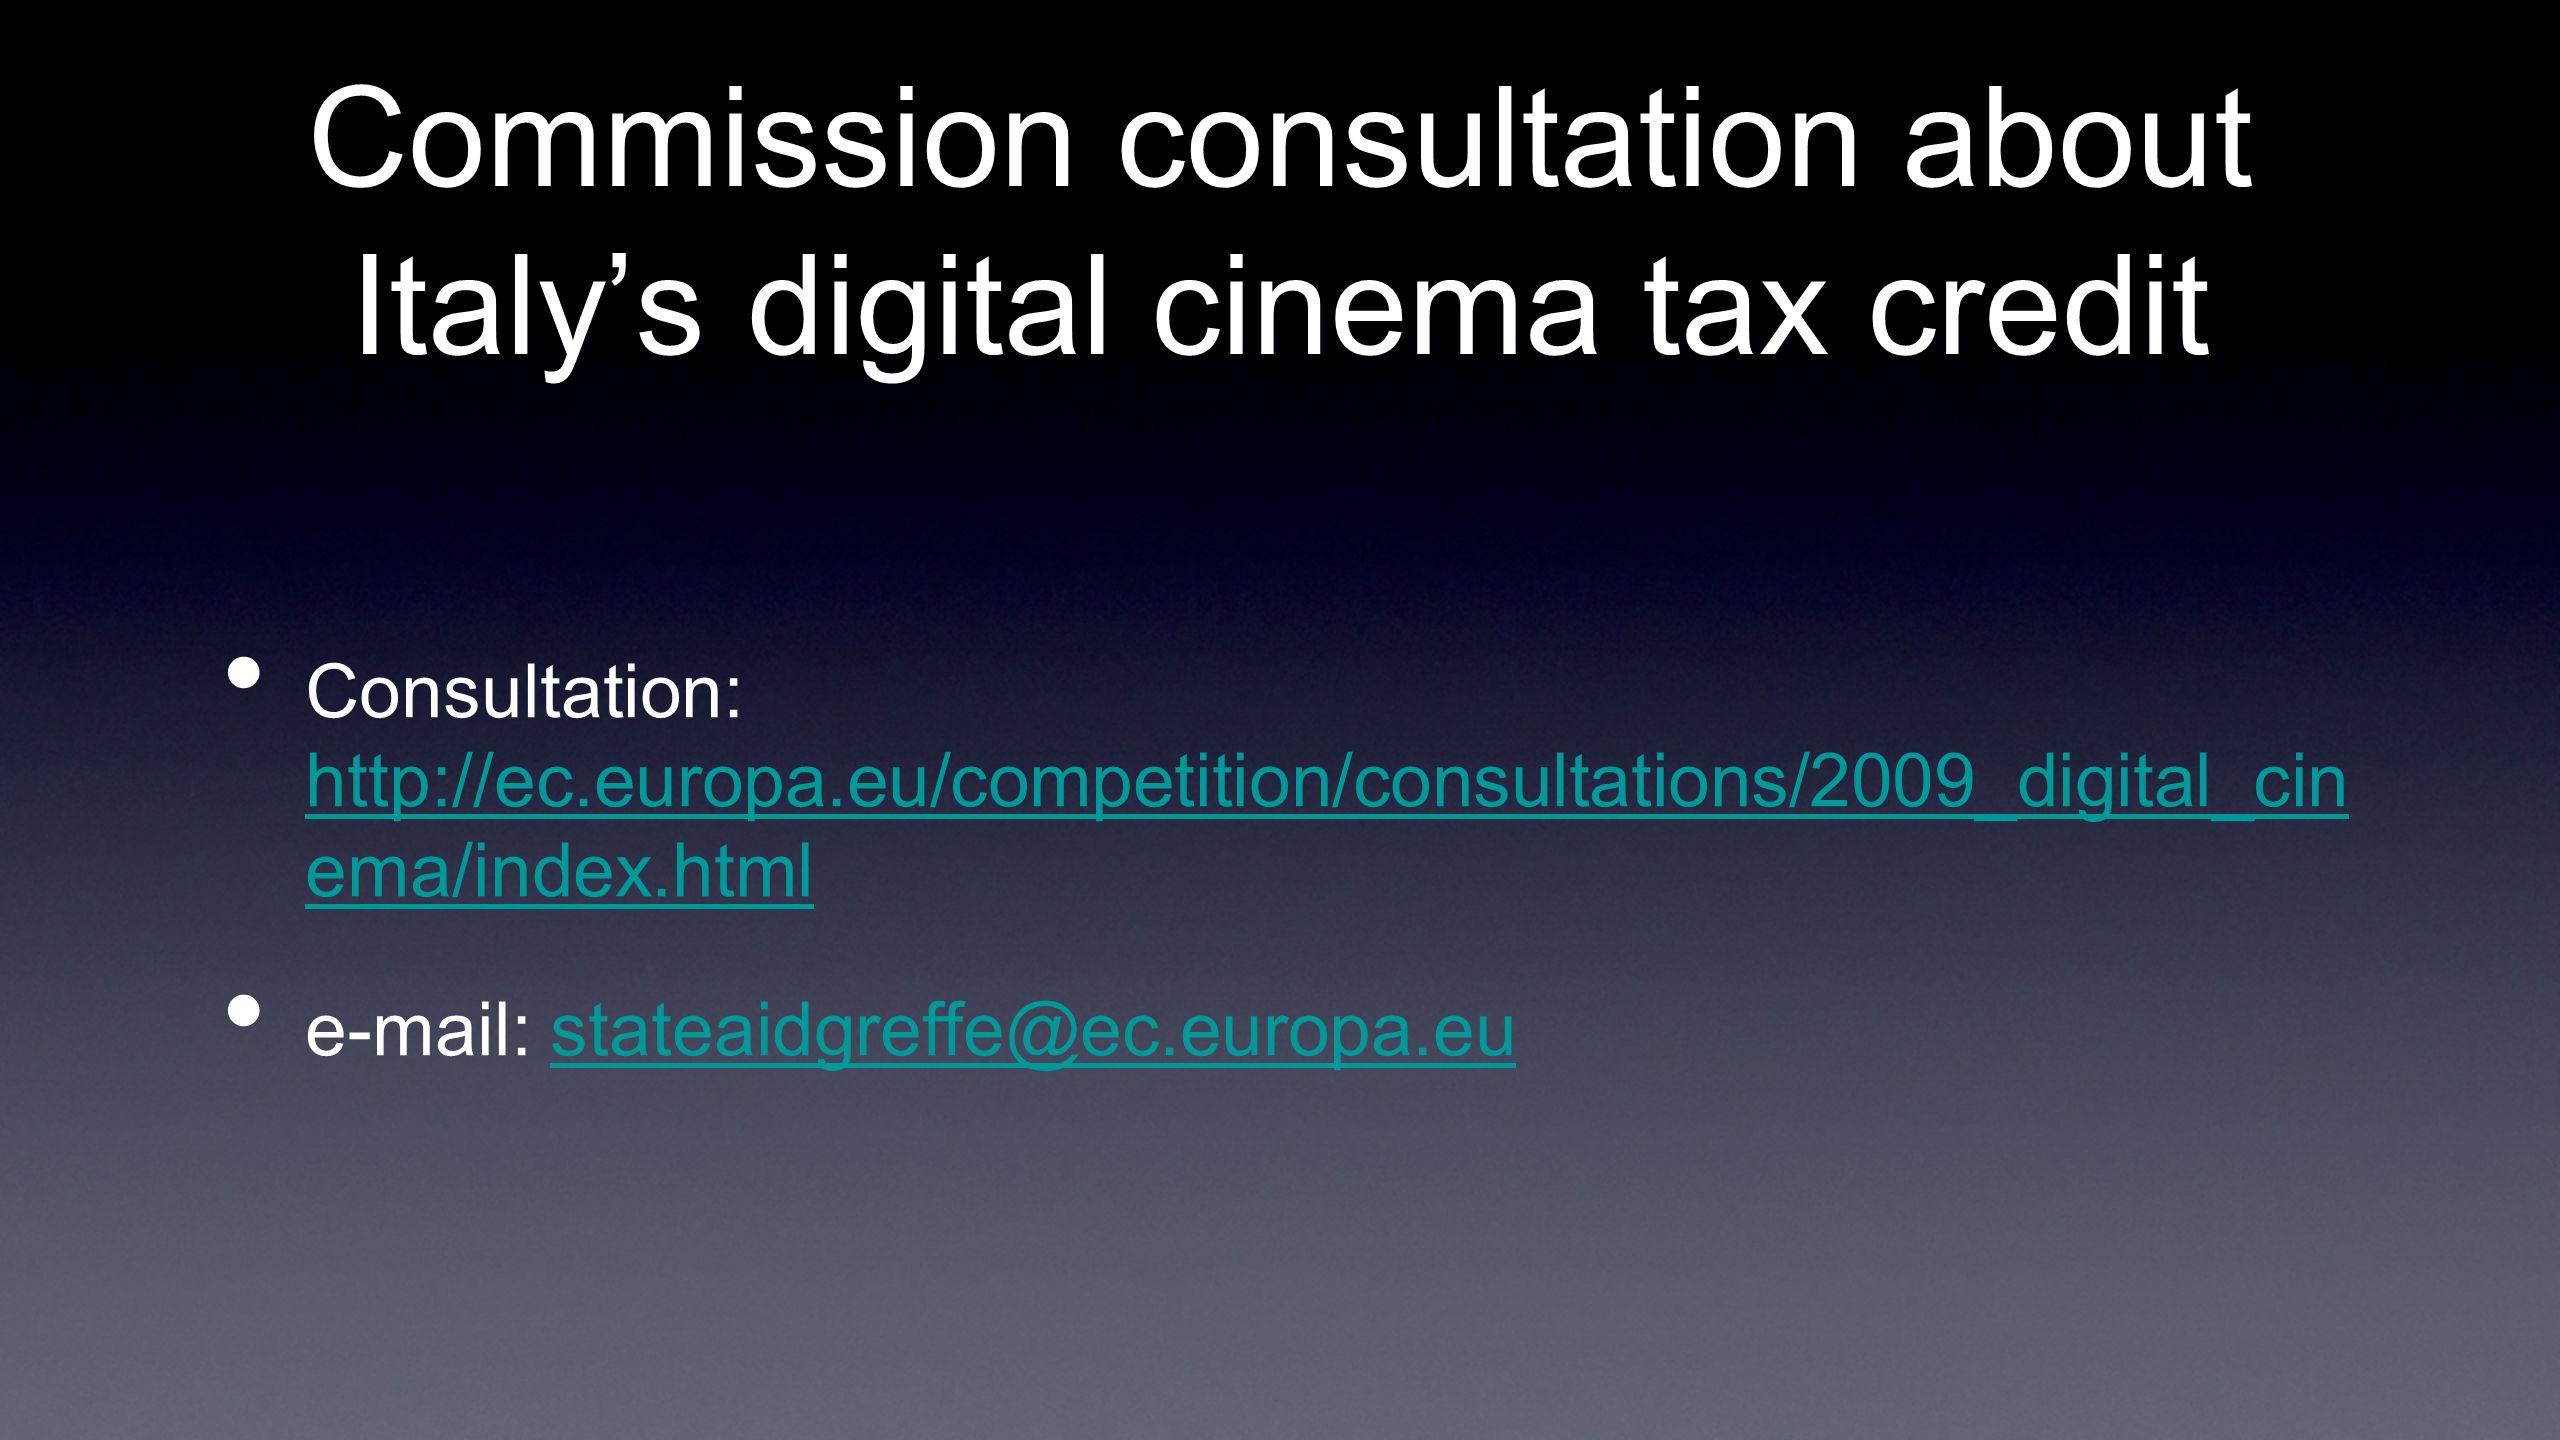 Commission consultation about Italys digital cinema tax credit Consultation: http://ec.europa.eu/competition/consultations/2009_digital_cin ema/index.